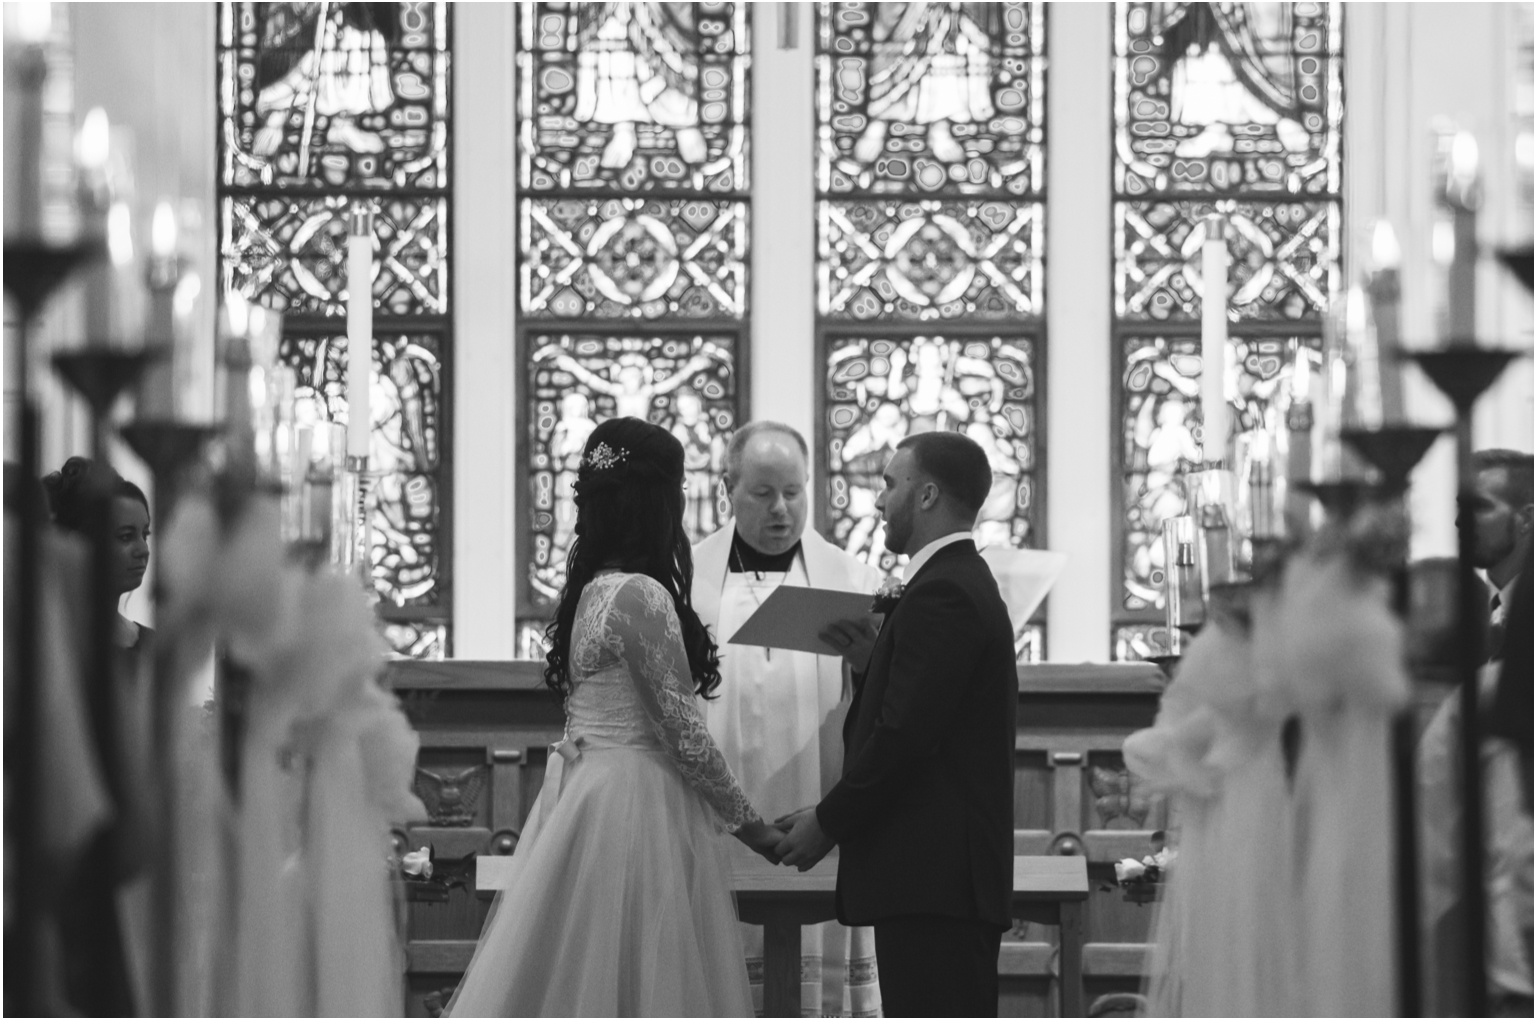 Married WIlliamsport PA Wedding getting wedding church cathedral